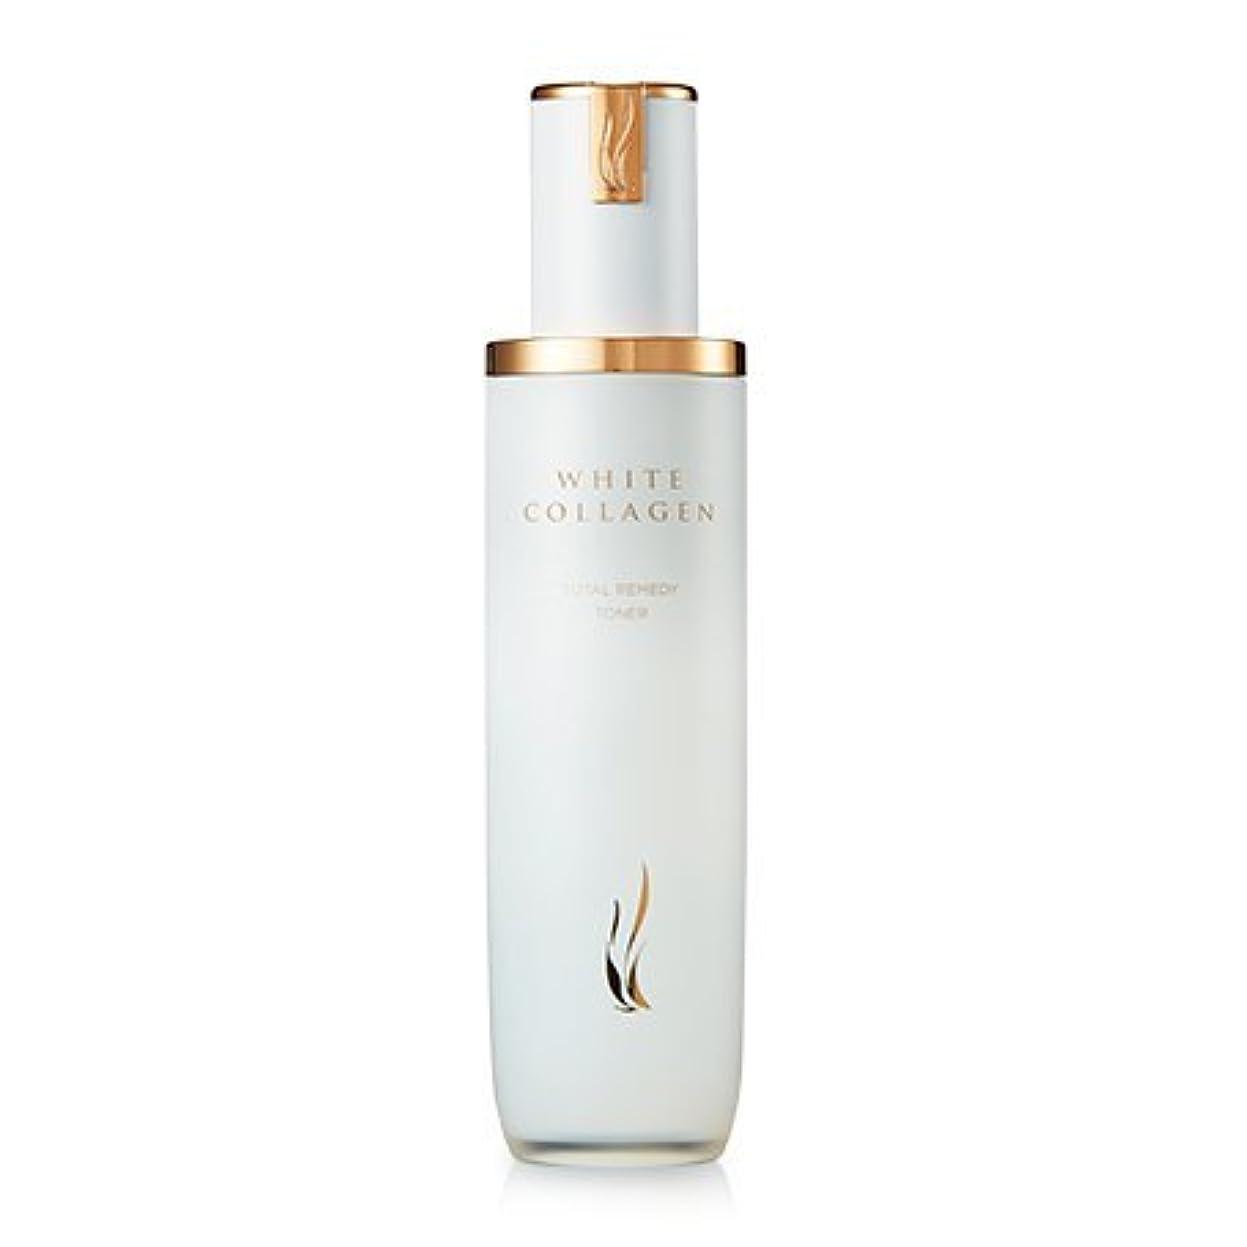 [New] A.H.C (AHC) White Collagen Total Remedy Toner 130ml/A.H.C ホワイト コラーゲン トータル レミディ トナー 130ml [並行輸入品]